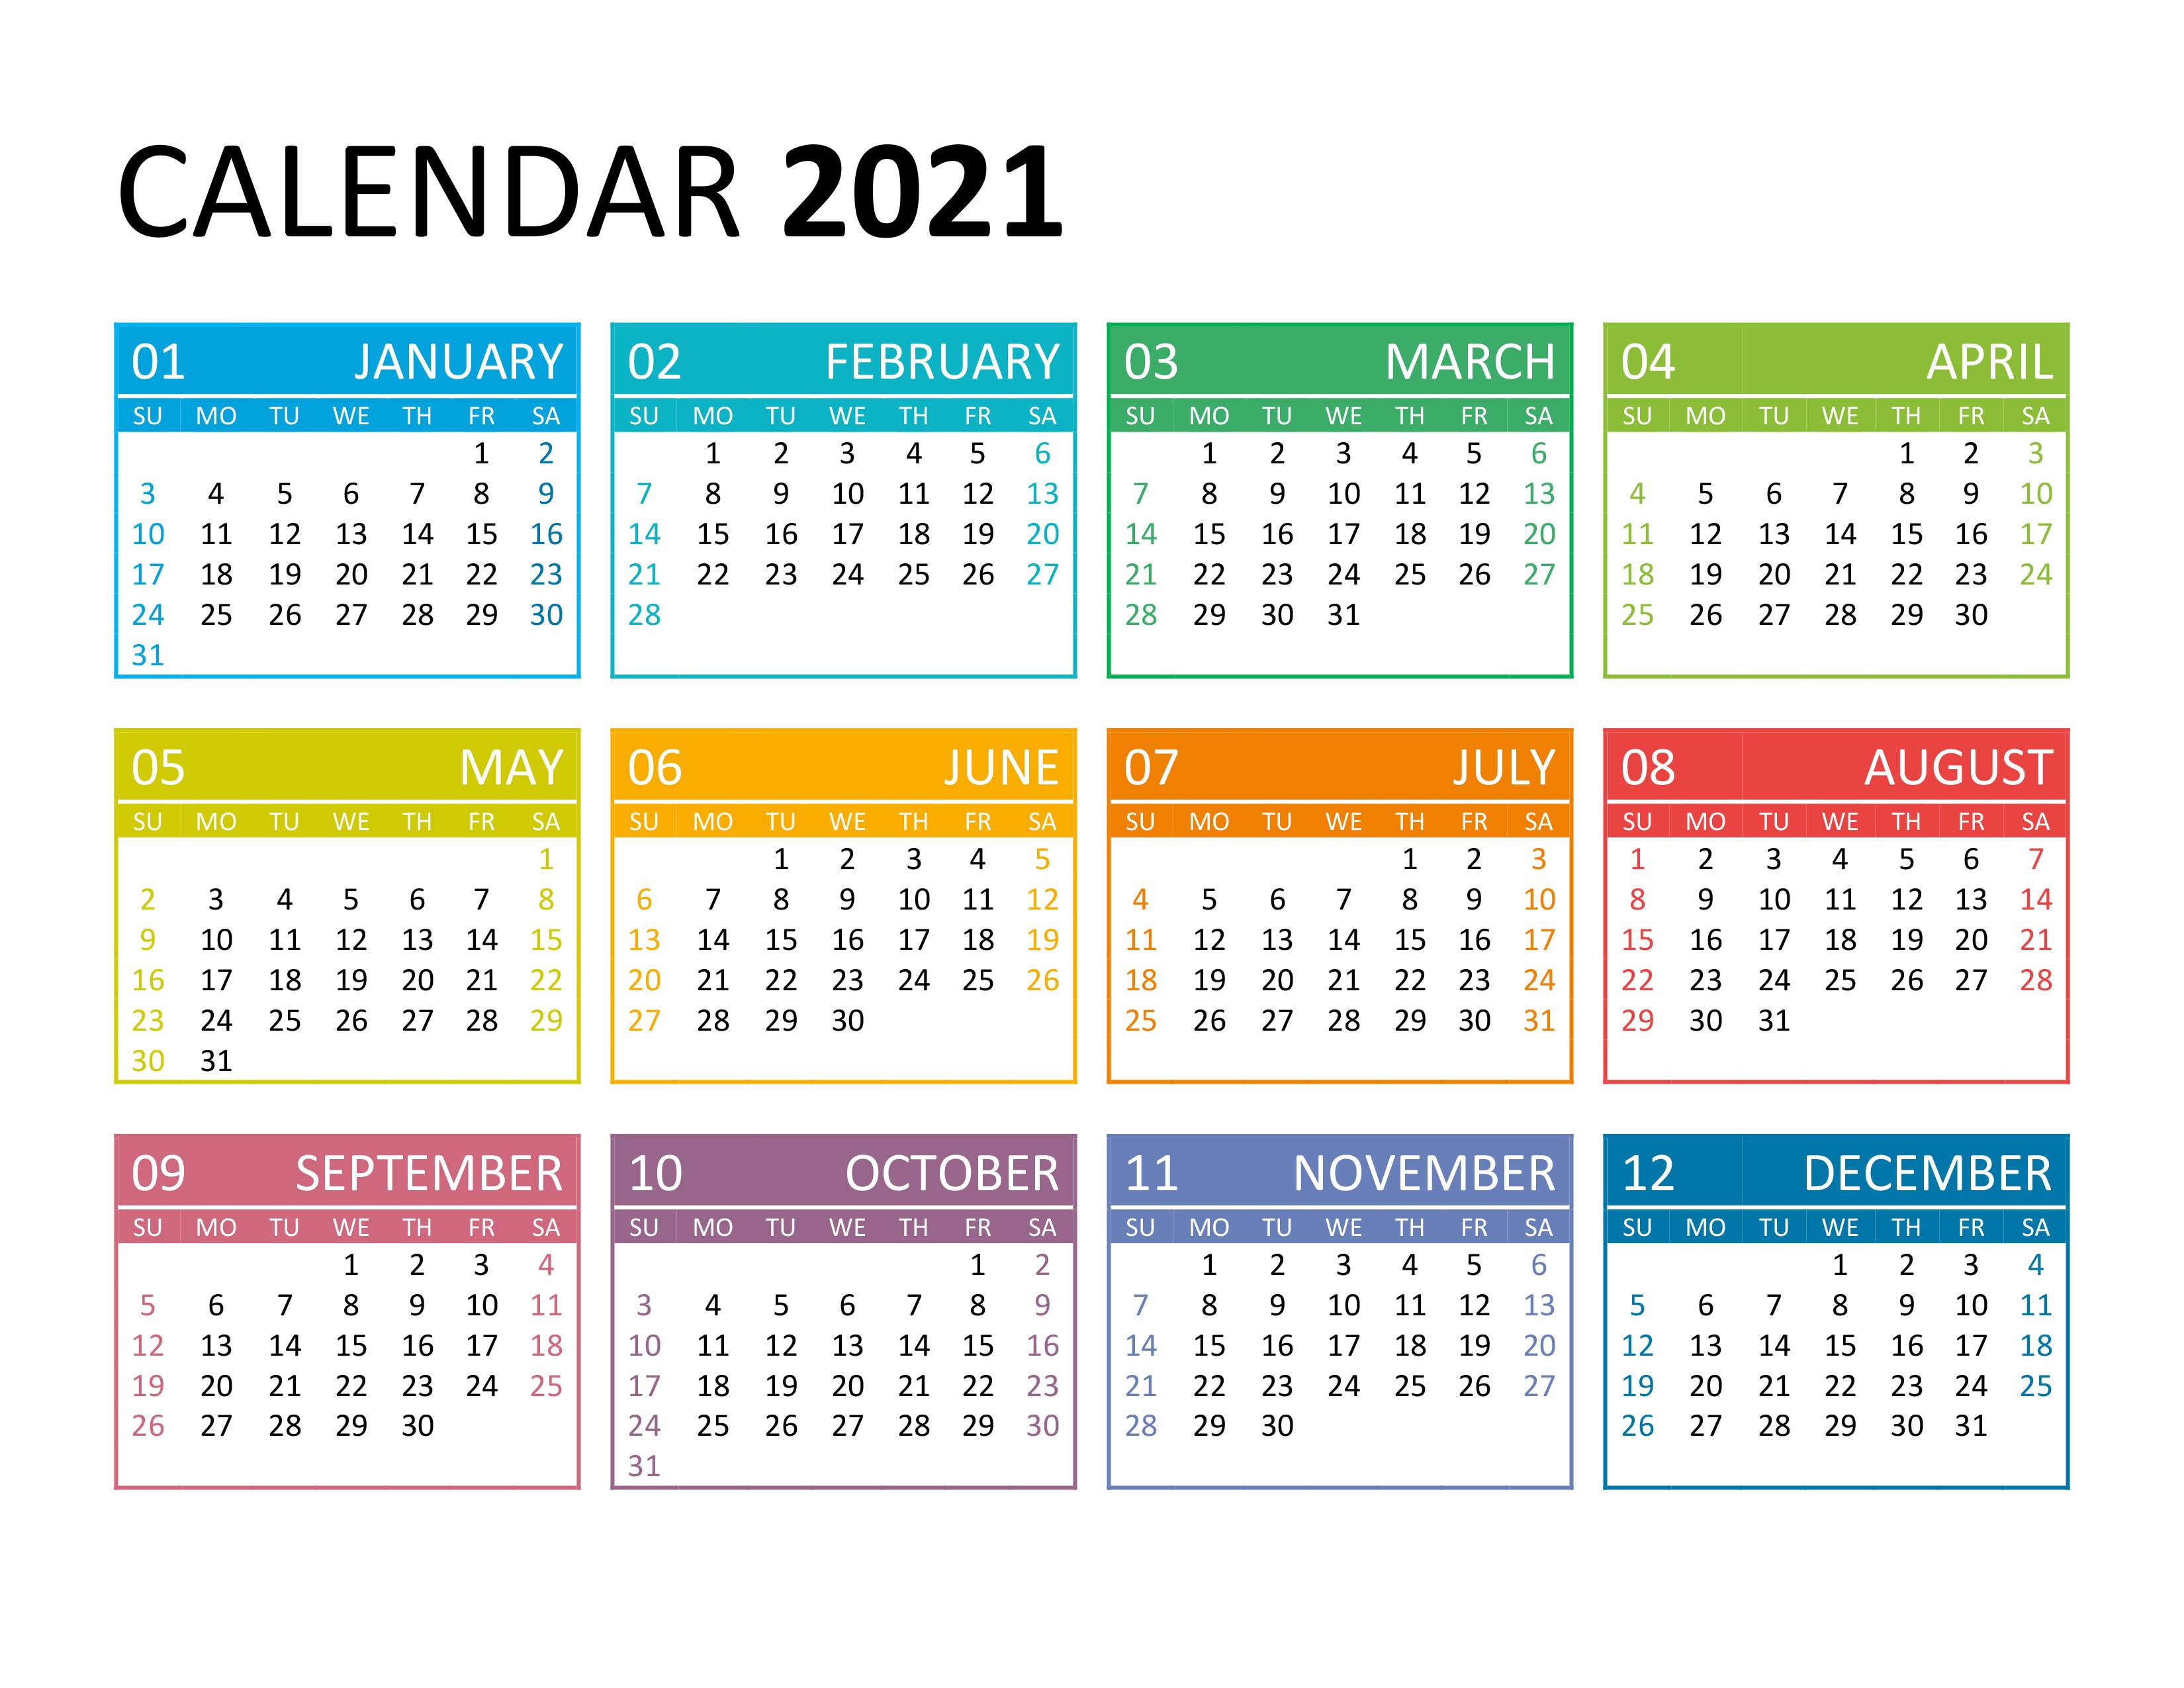 Yearly calendar 2021 - free-calendar.su